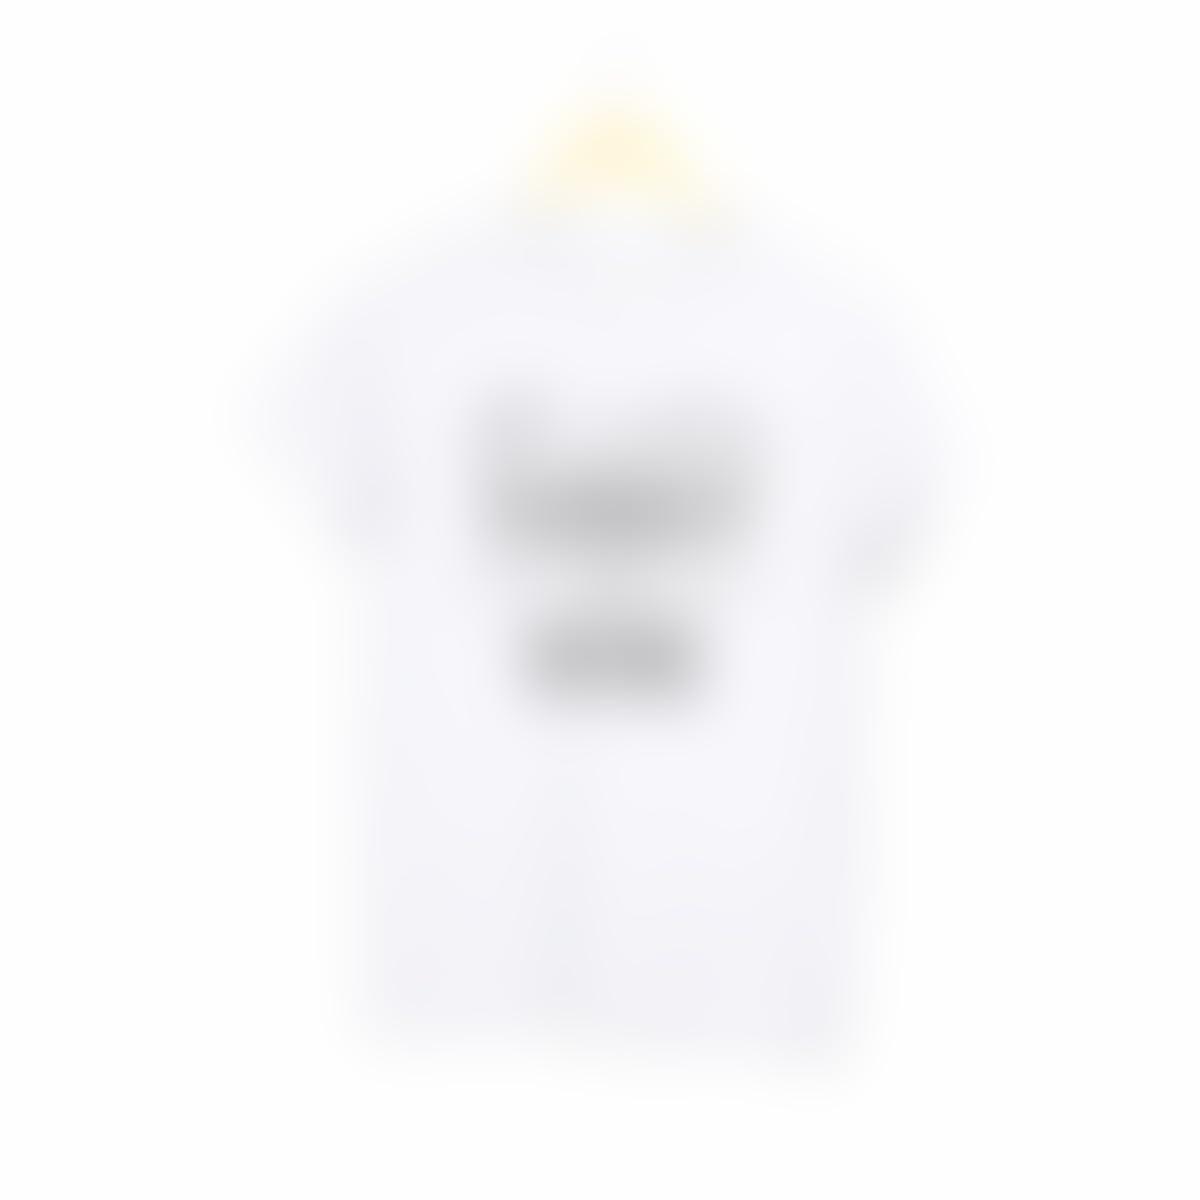 88cb66eb0cdf Amazon.com: Thanksgiving shirts-couples cute shirts-thankful shirt- pumpkin  spice shirt-thanksgiving party shirts-fall shirt: Handmade